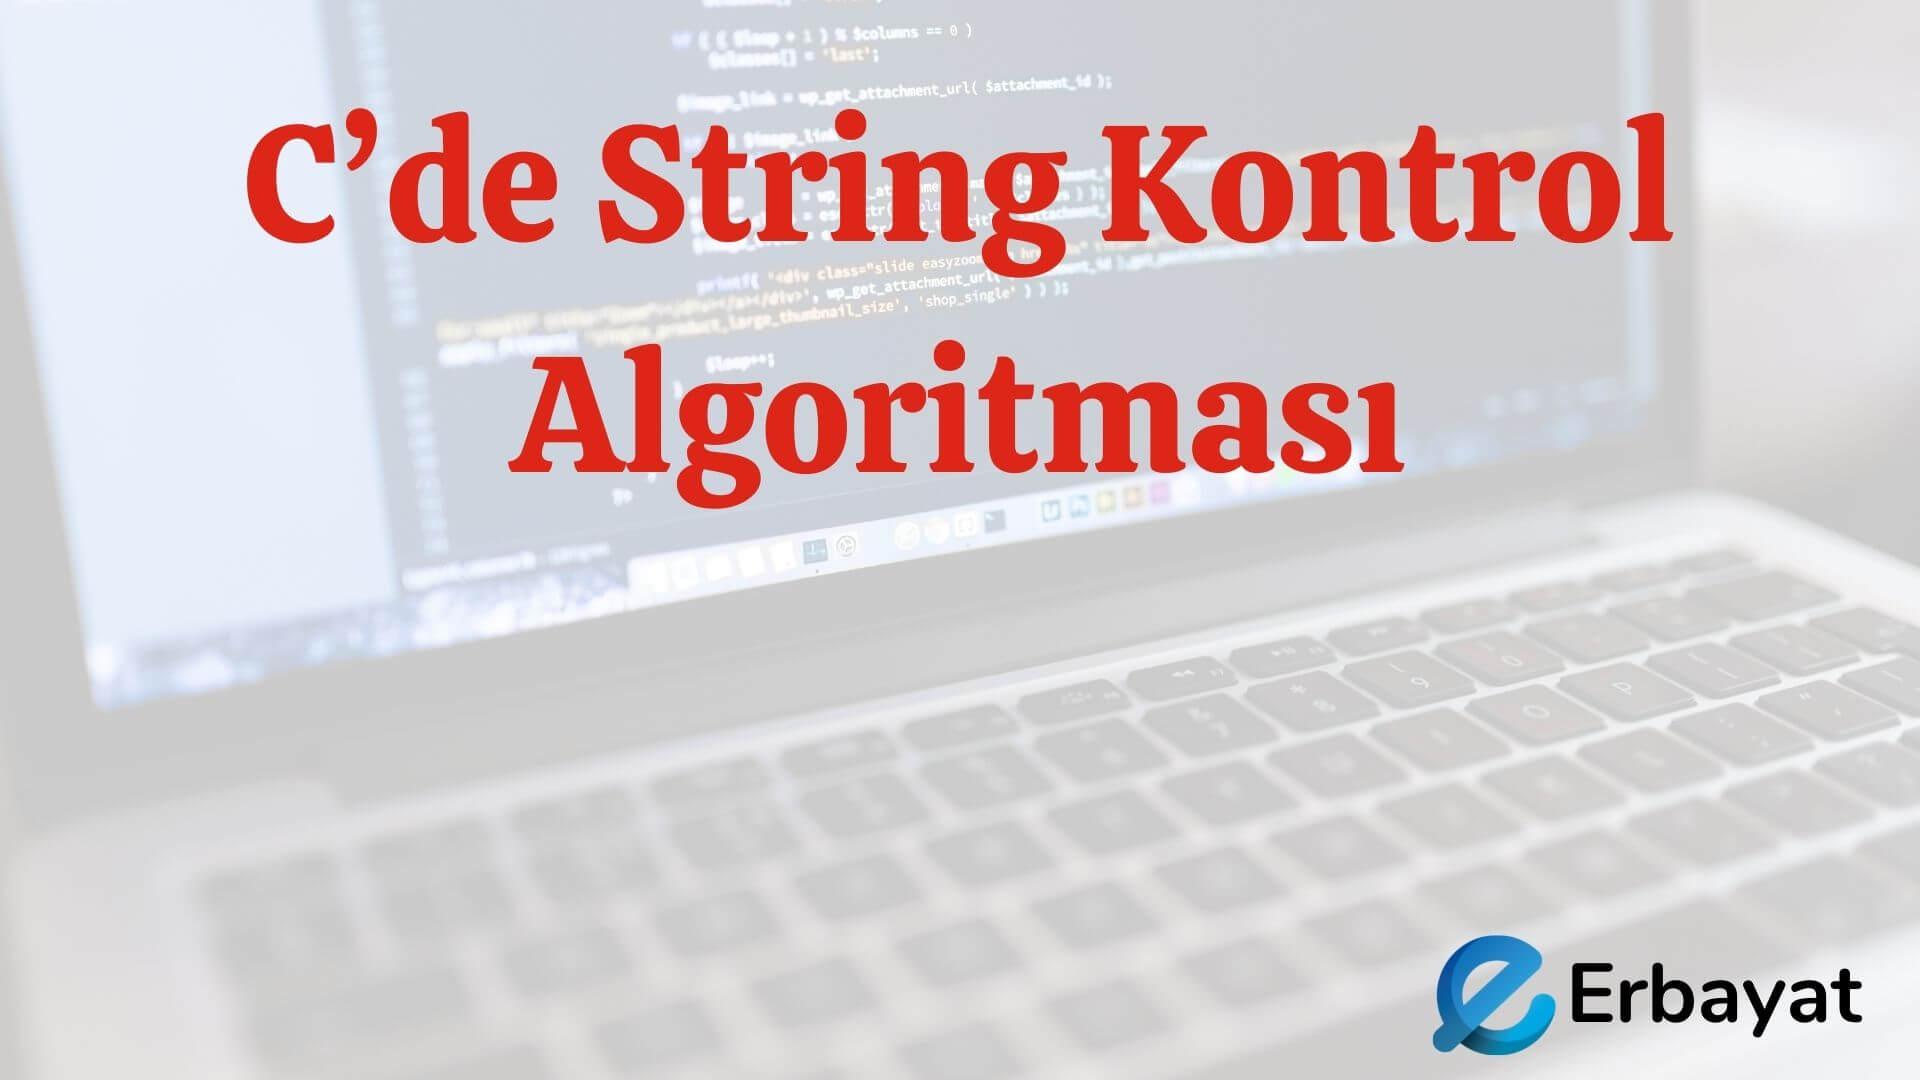 C'de String Kontrol Algoritması